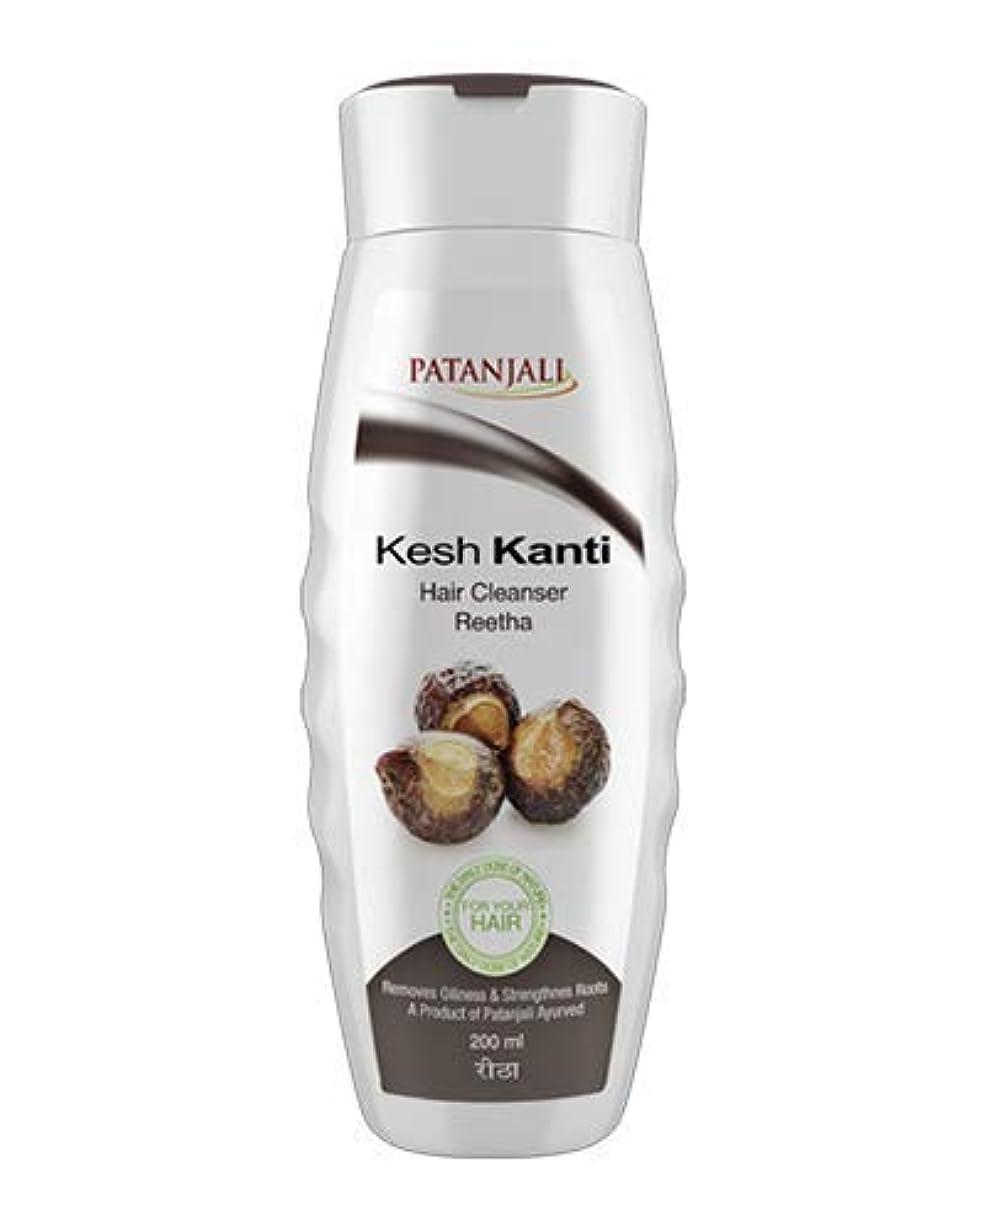 引数研磨剤削減Patanjali Kesh Kanti Reetha Hair Cleanser Shampoo, 200ml